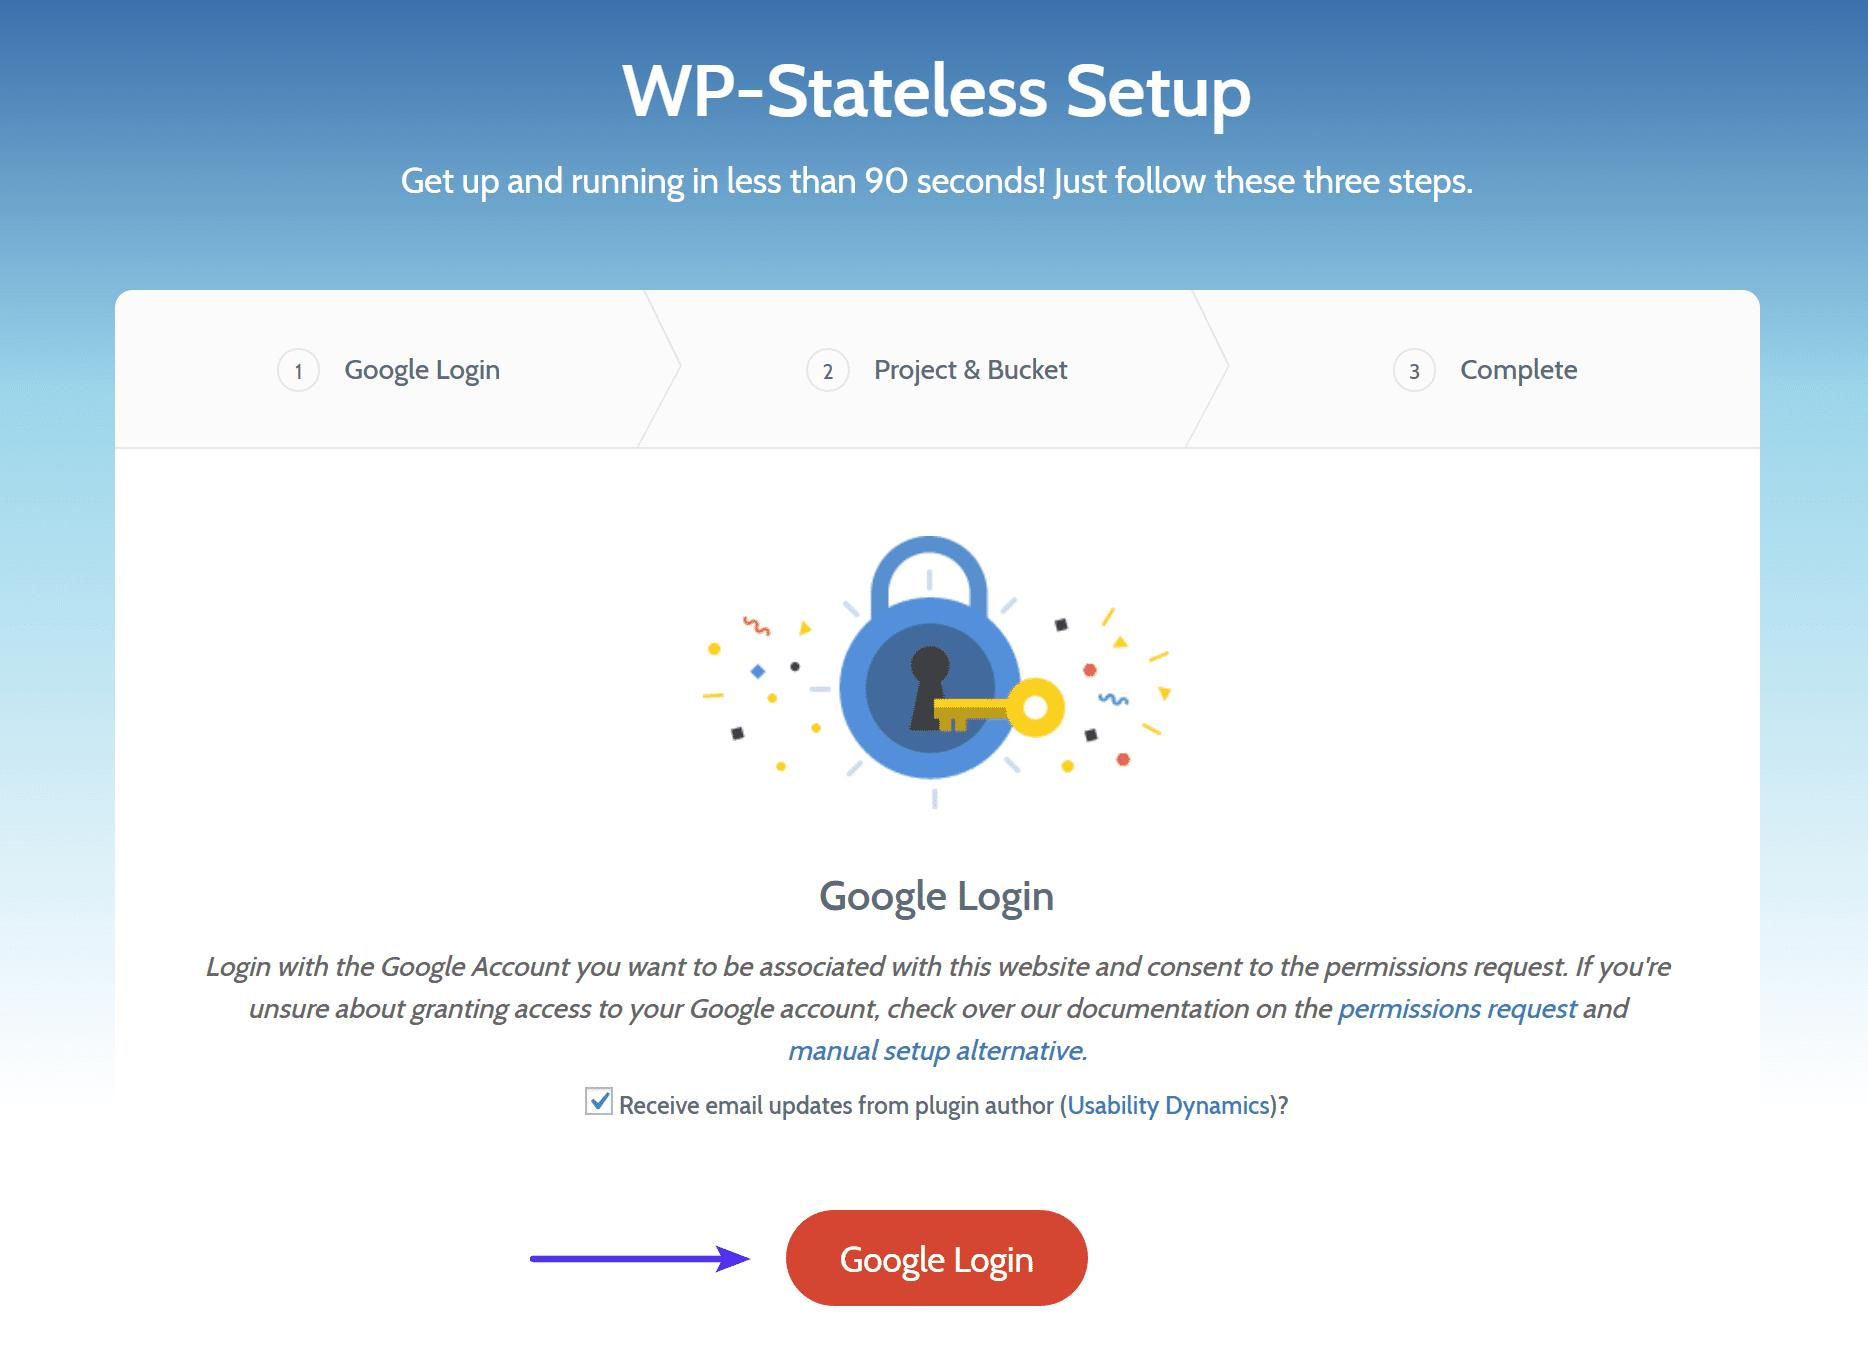 WP-Stateless Google Login